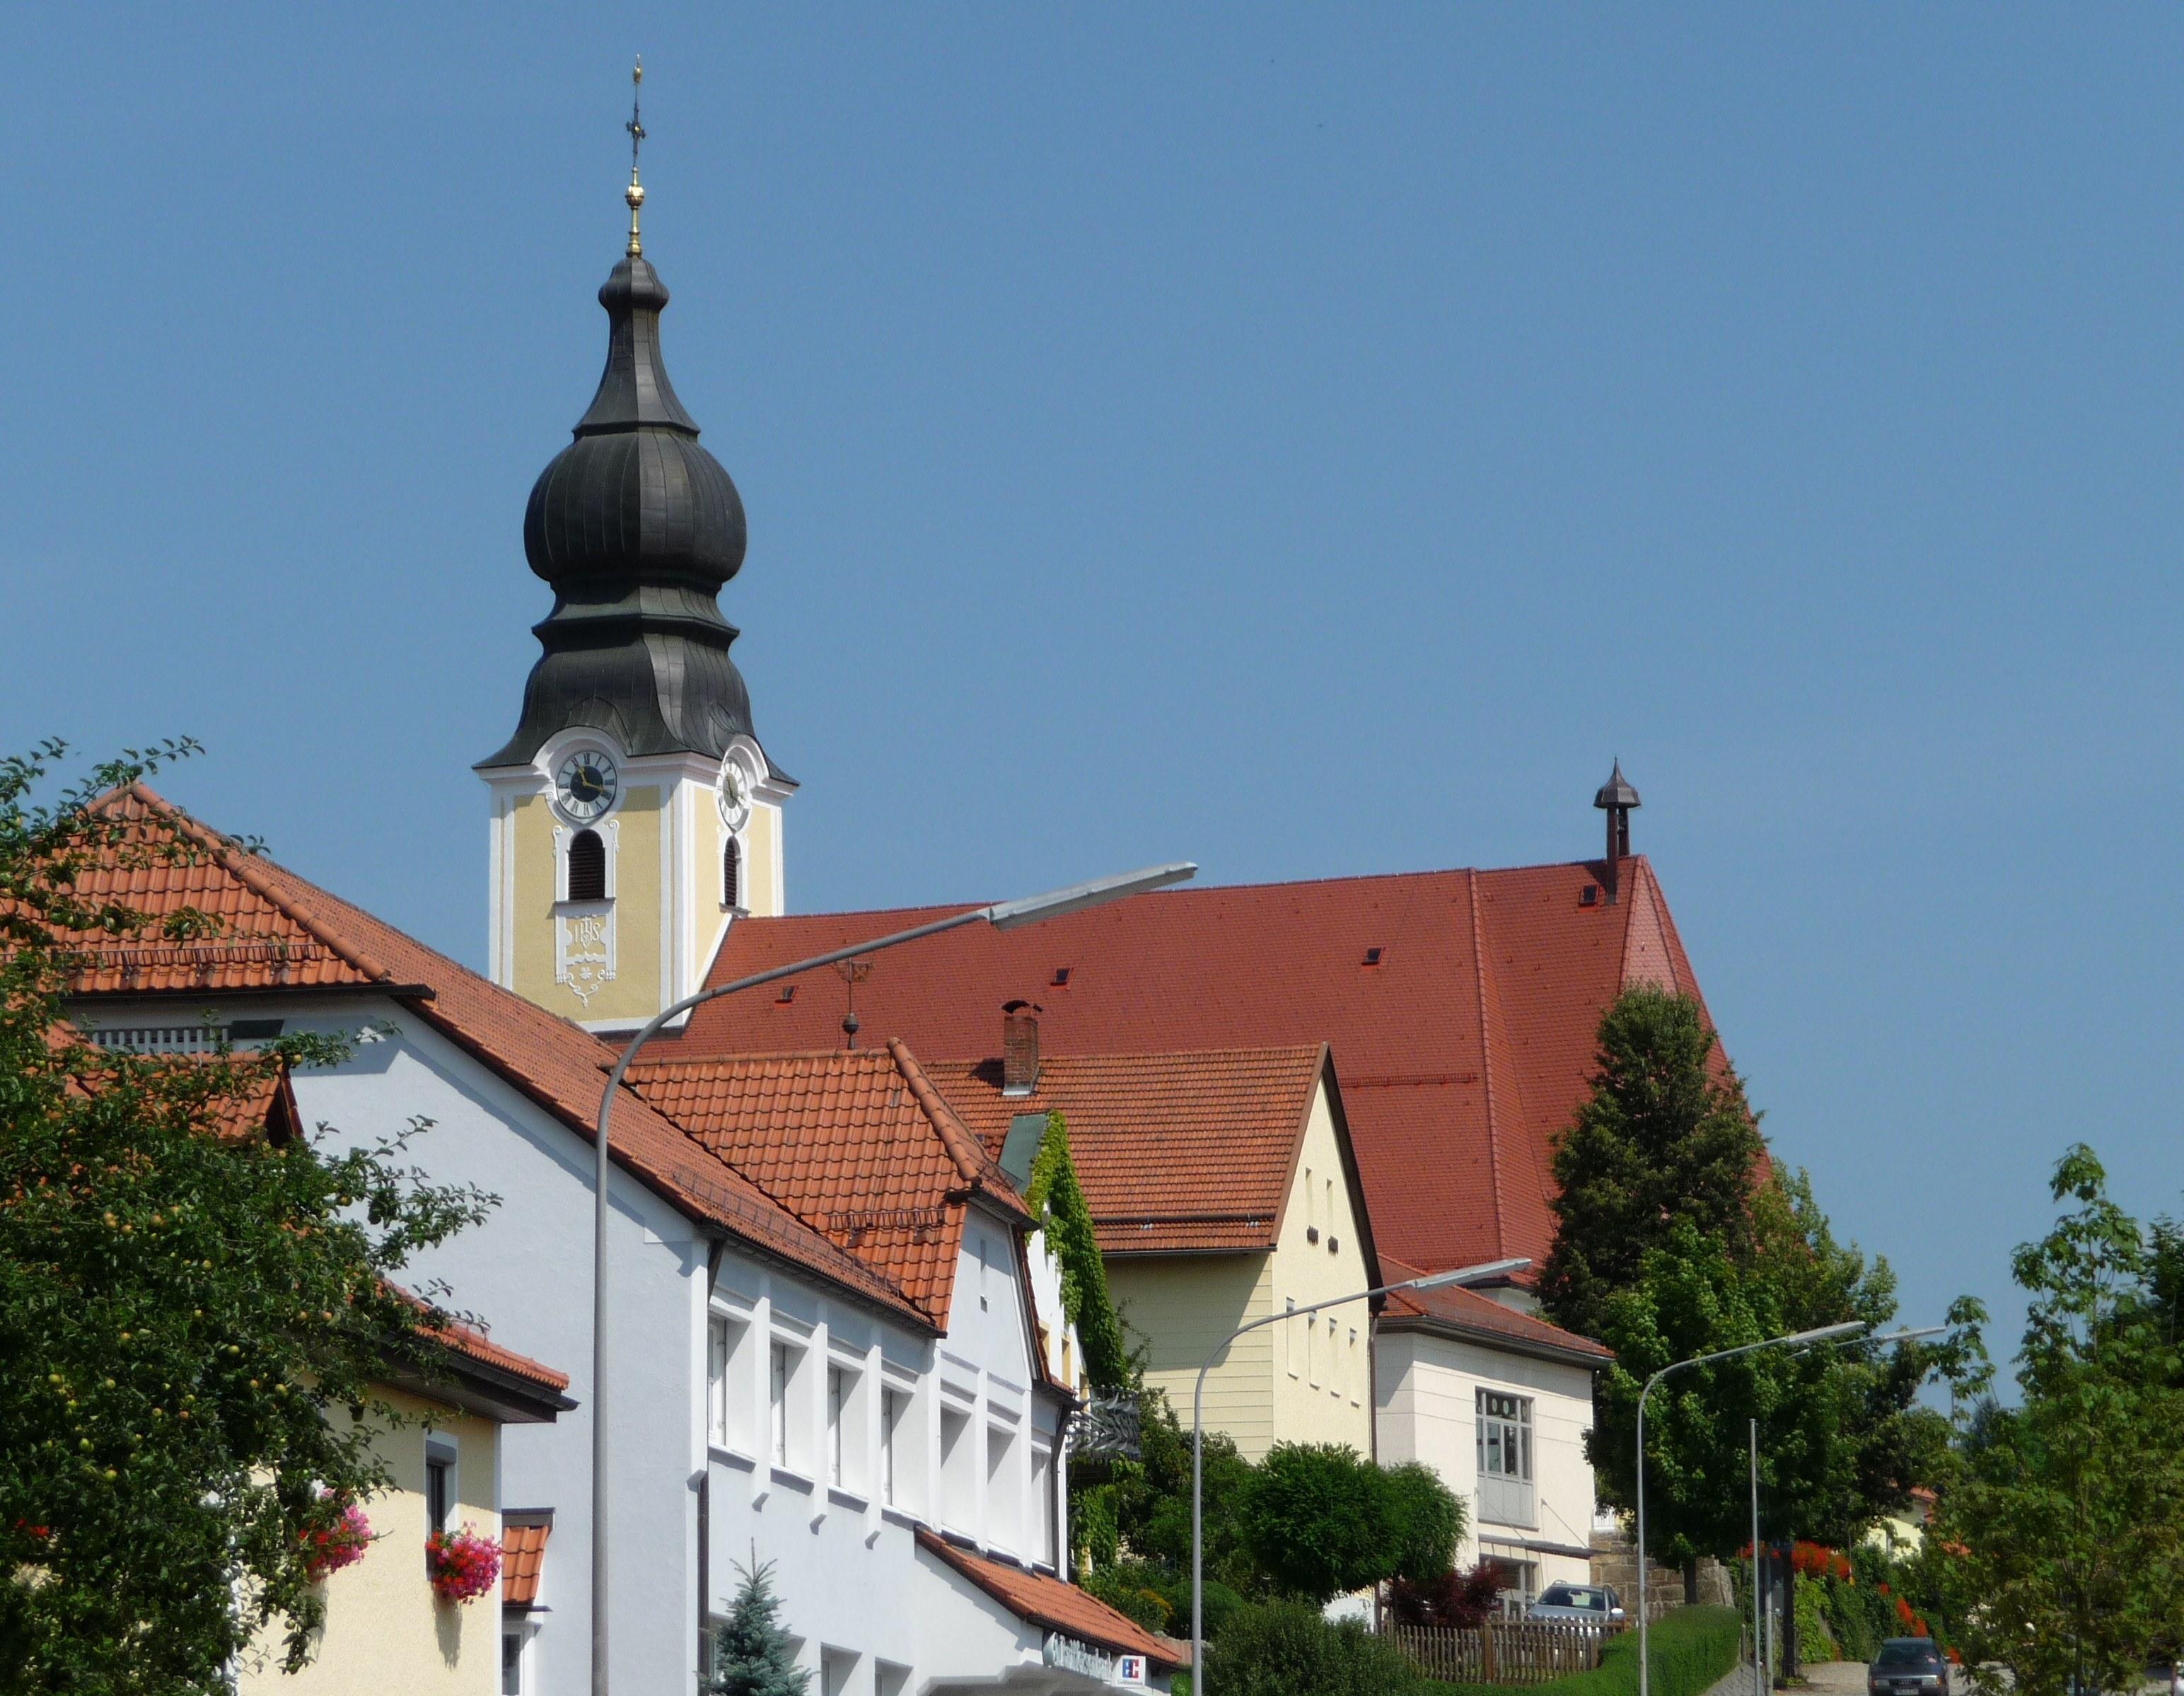 Pfarrkirche Rc3B6Hrnbach